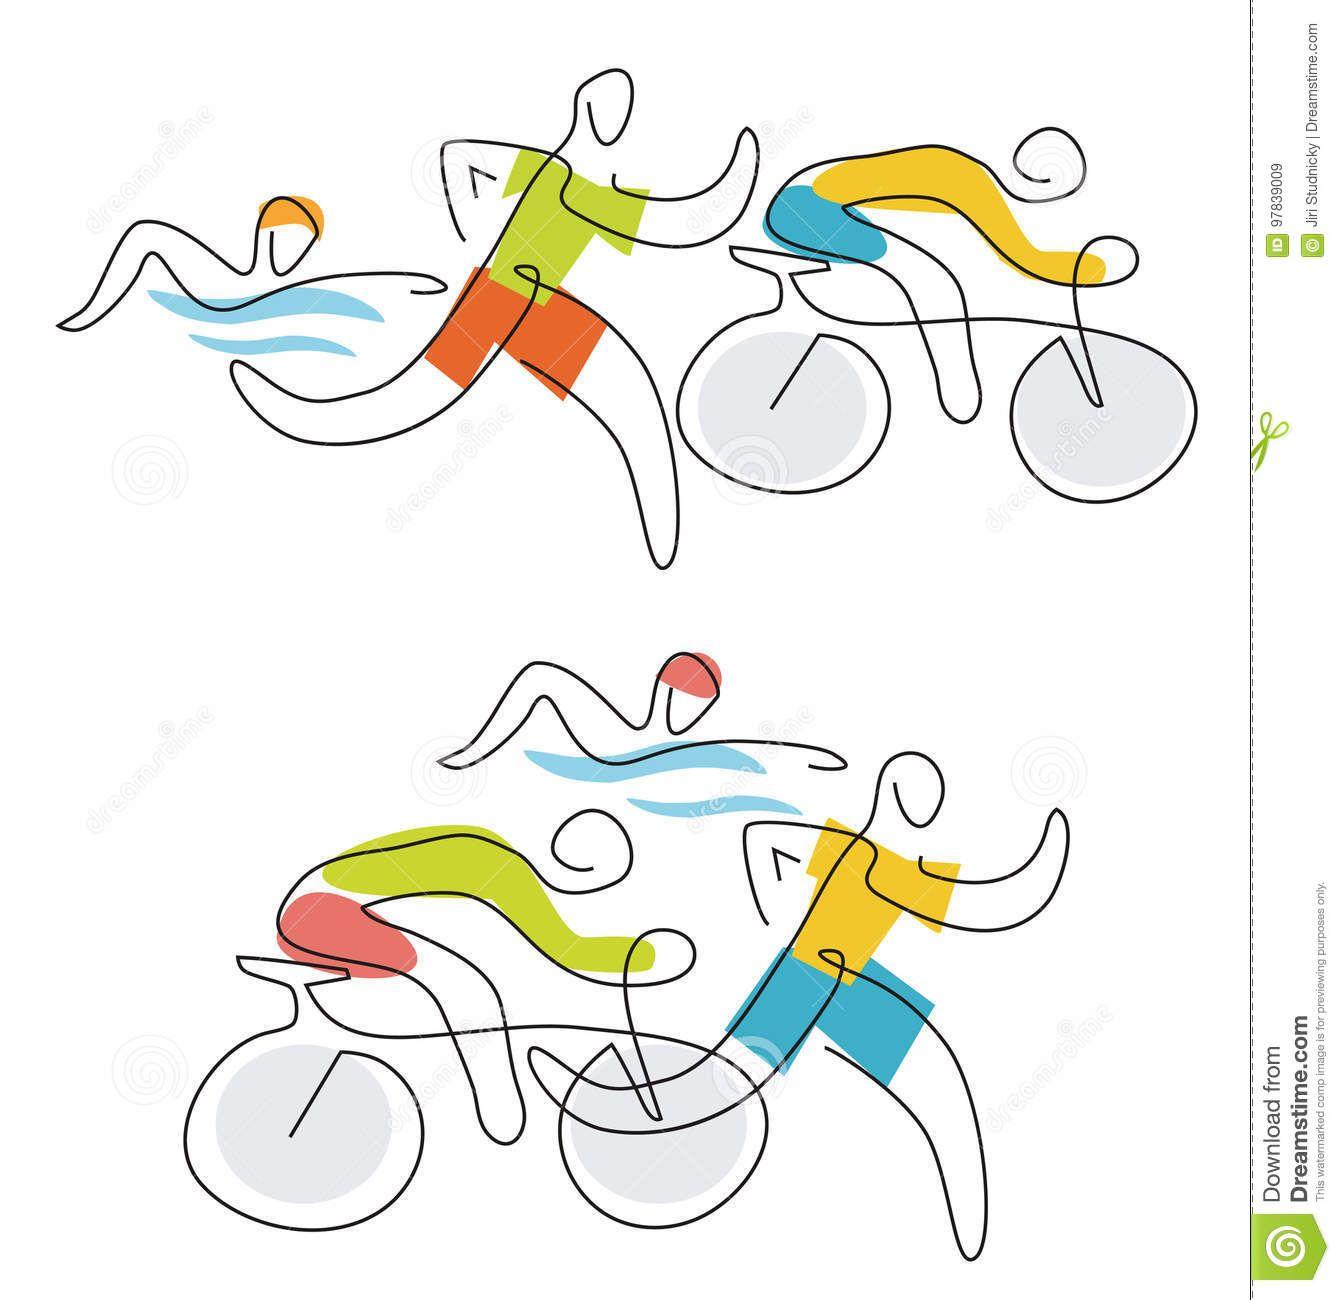 Triathlon Race Line Art Two Illustration Athletes Stylized